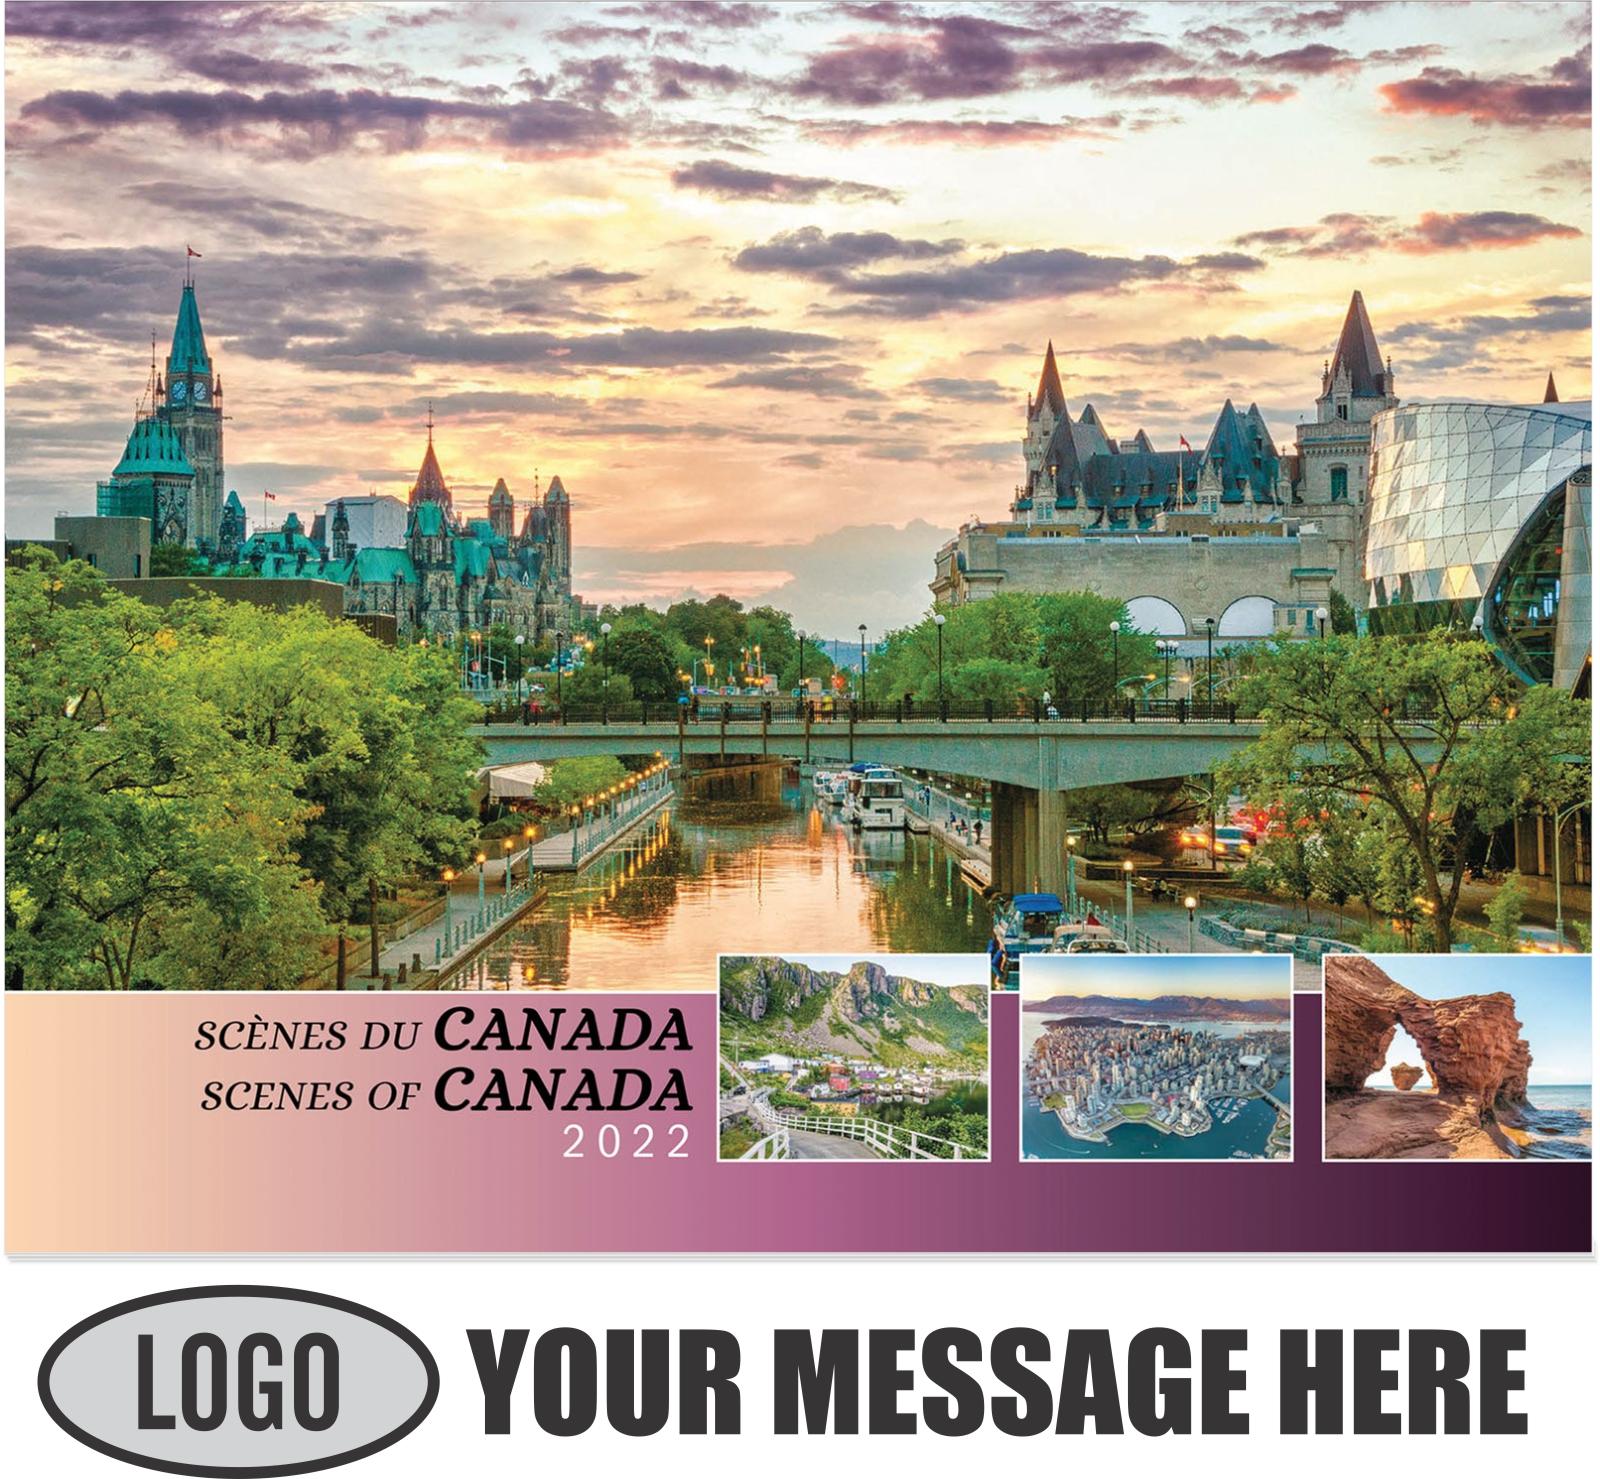 2022 Scenes of Canada(French-English bilingual) Promotional Calendar